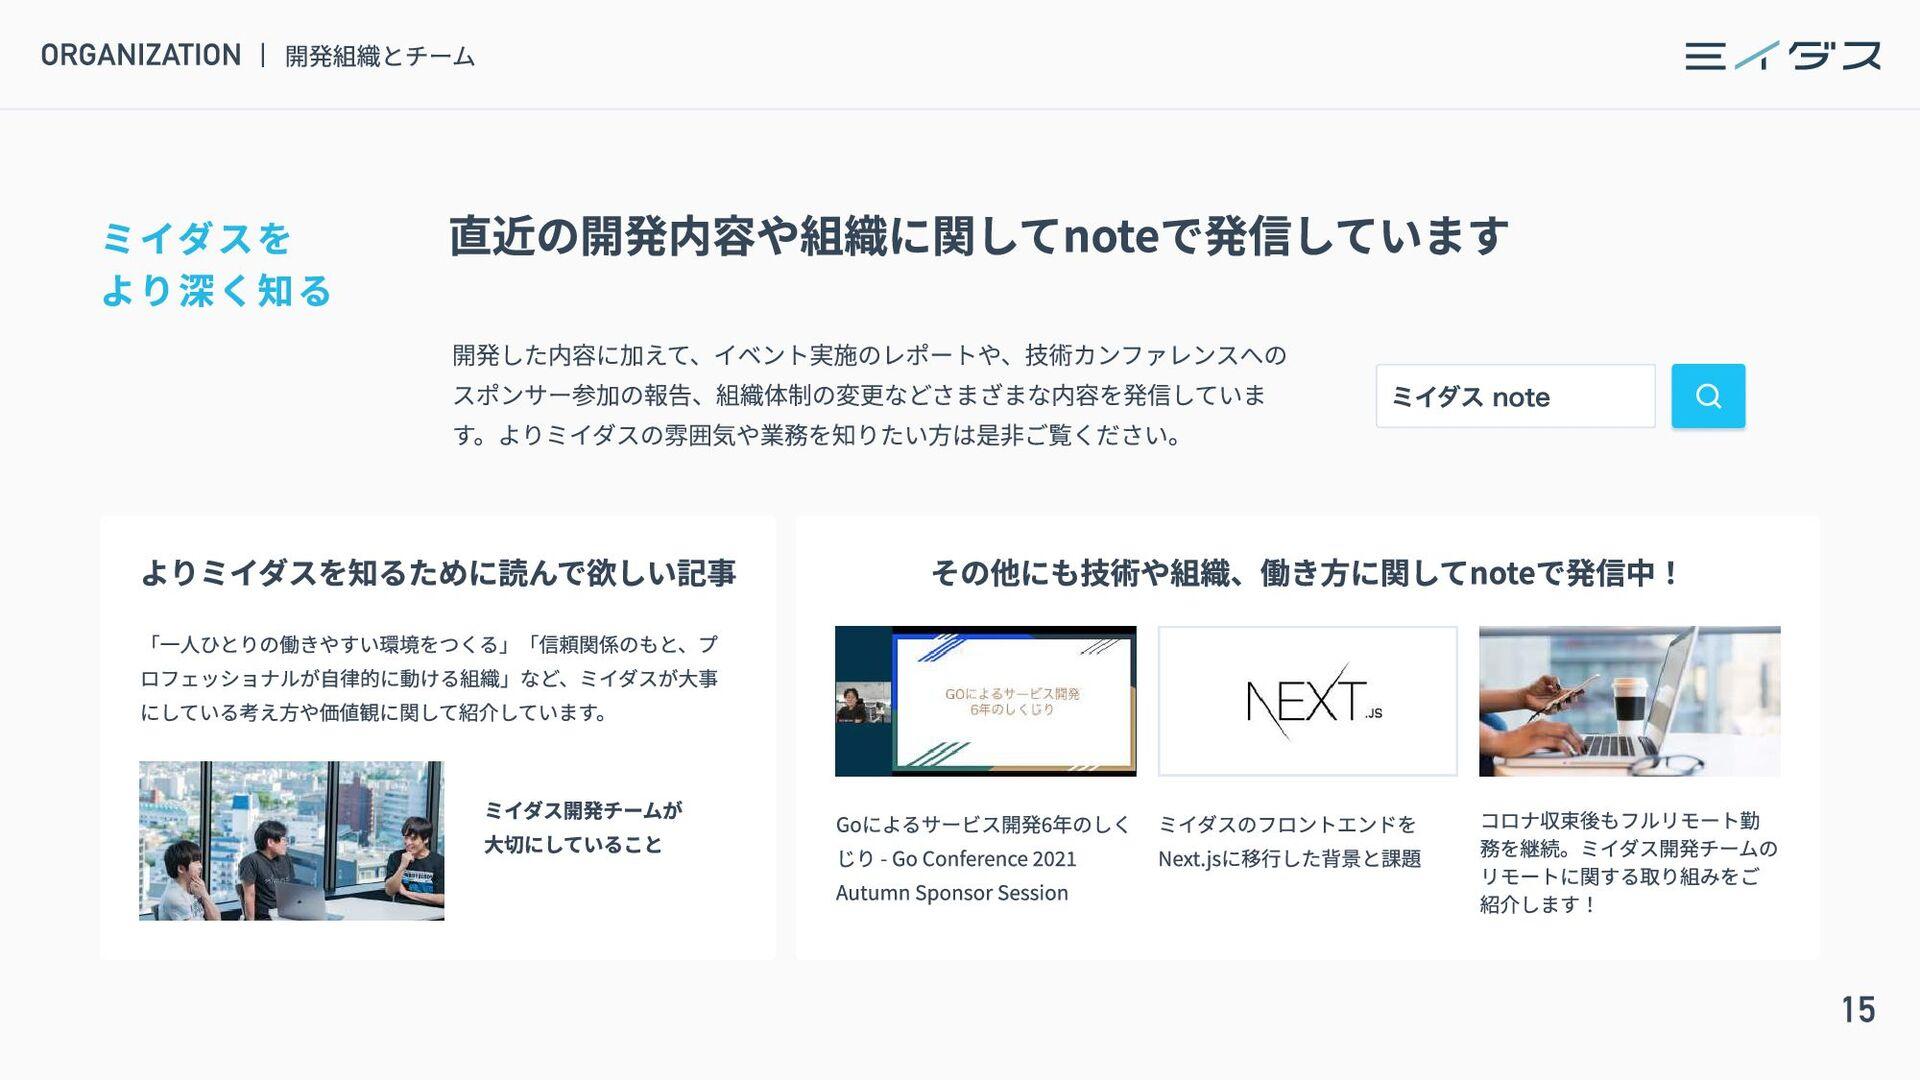 16 MEMBERS メンバー紹介 開発チームリーダー 磯崎さん SIerで証券会社や保険会社...